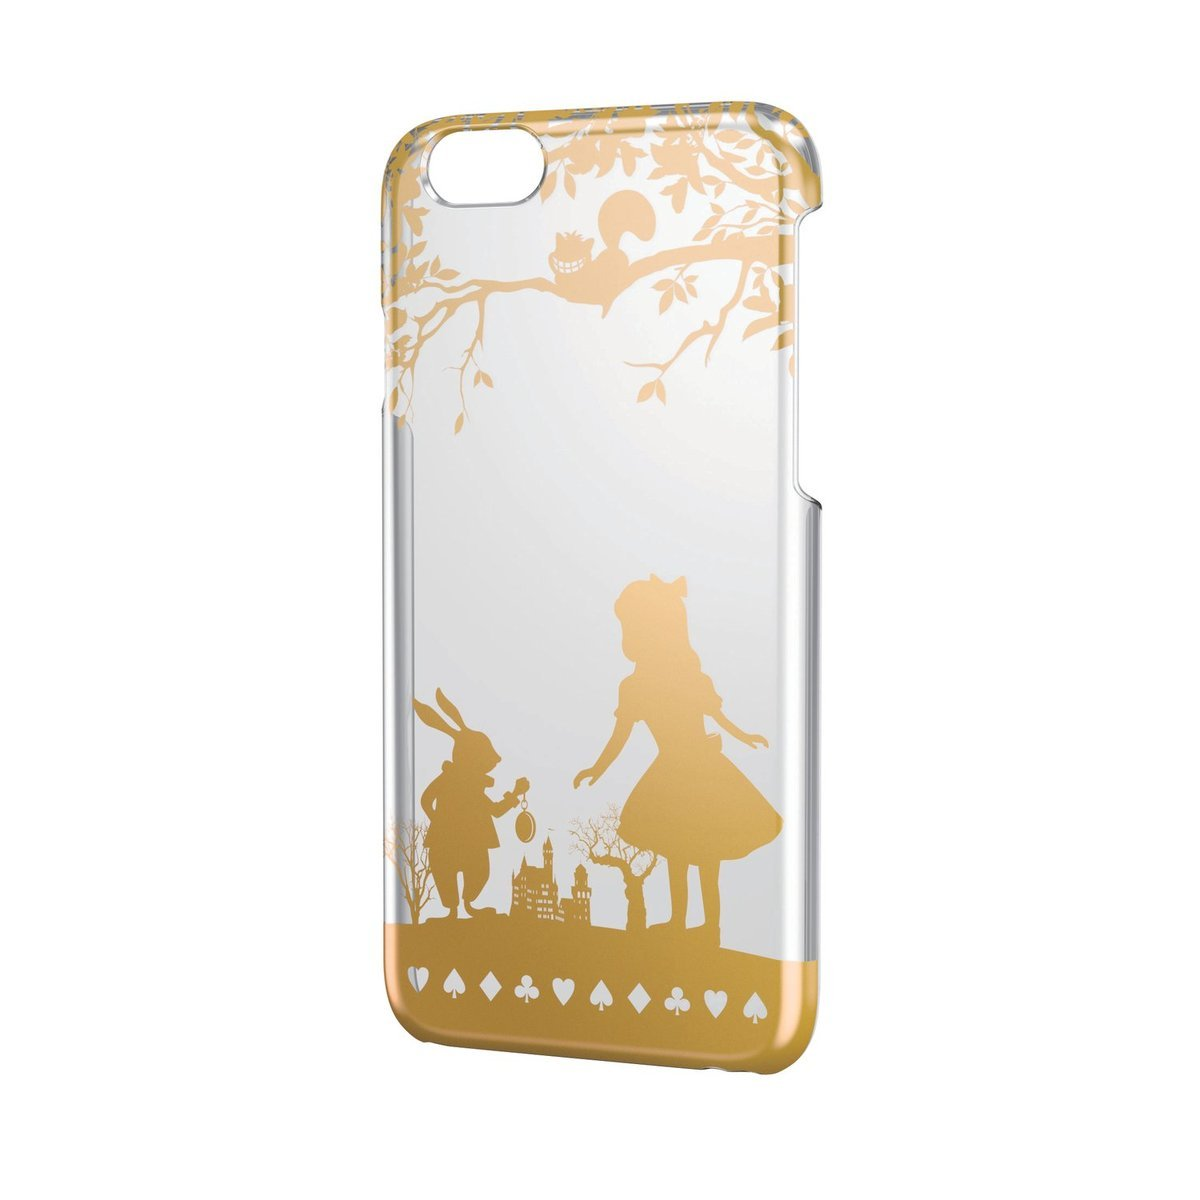 iPhone 6/6S 金色圖案硬殼(愛麗斯)